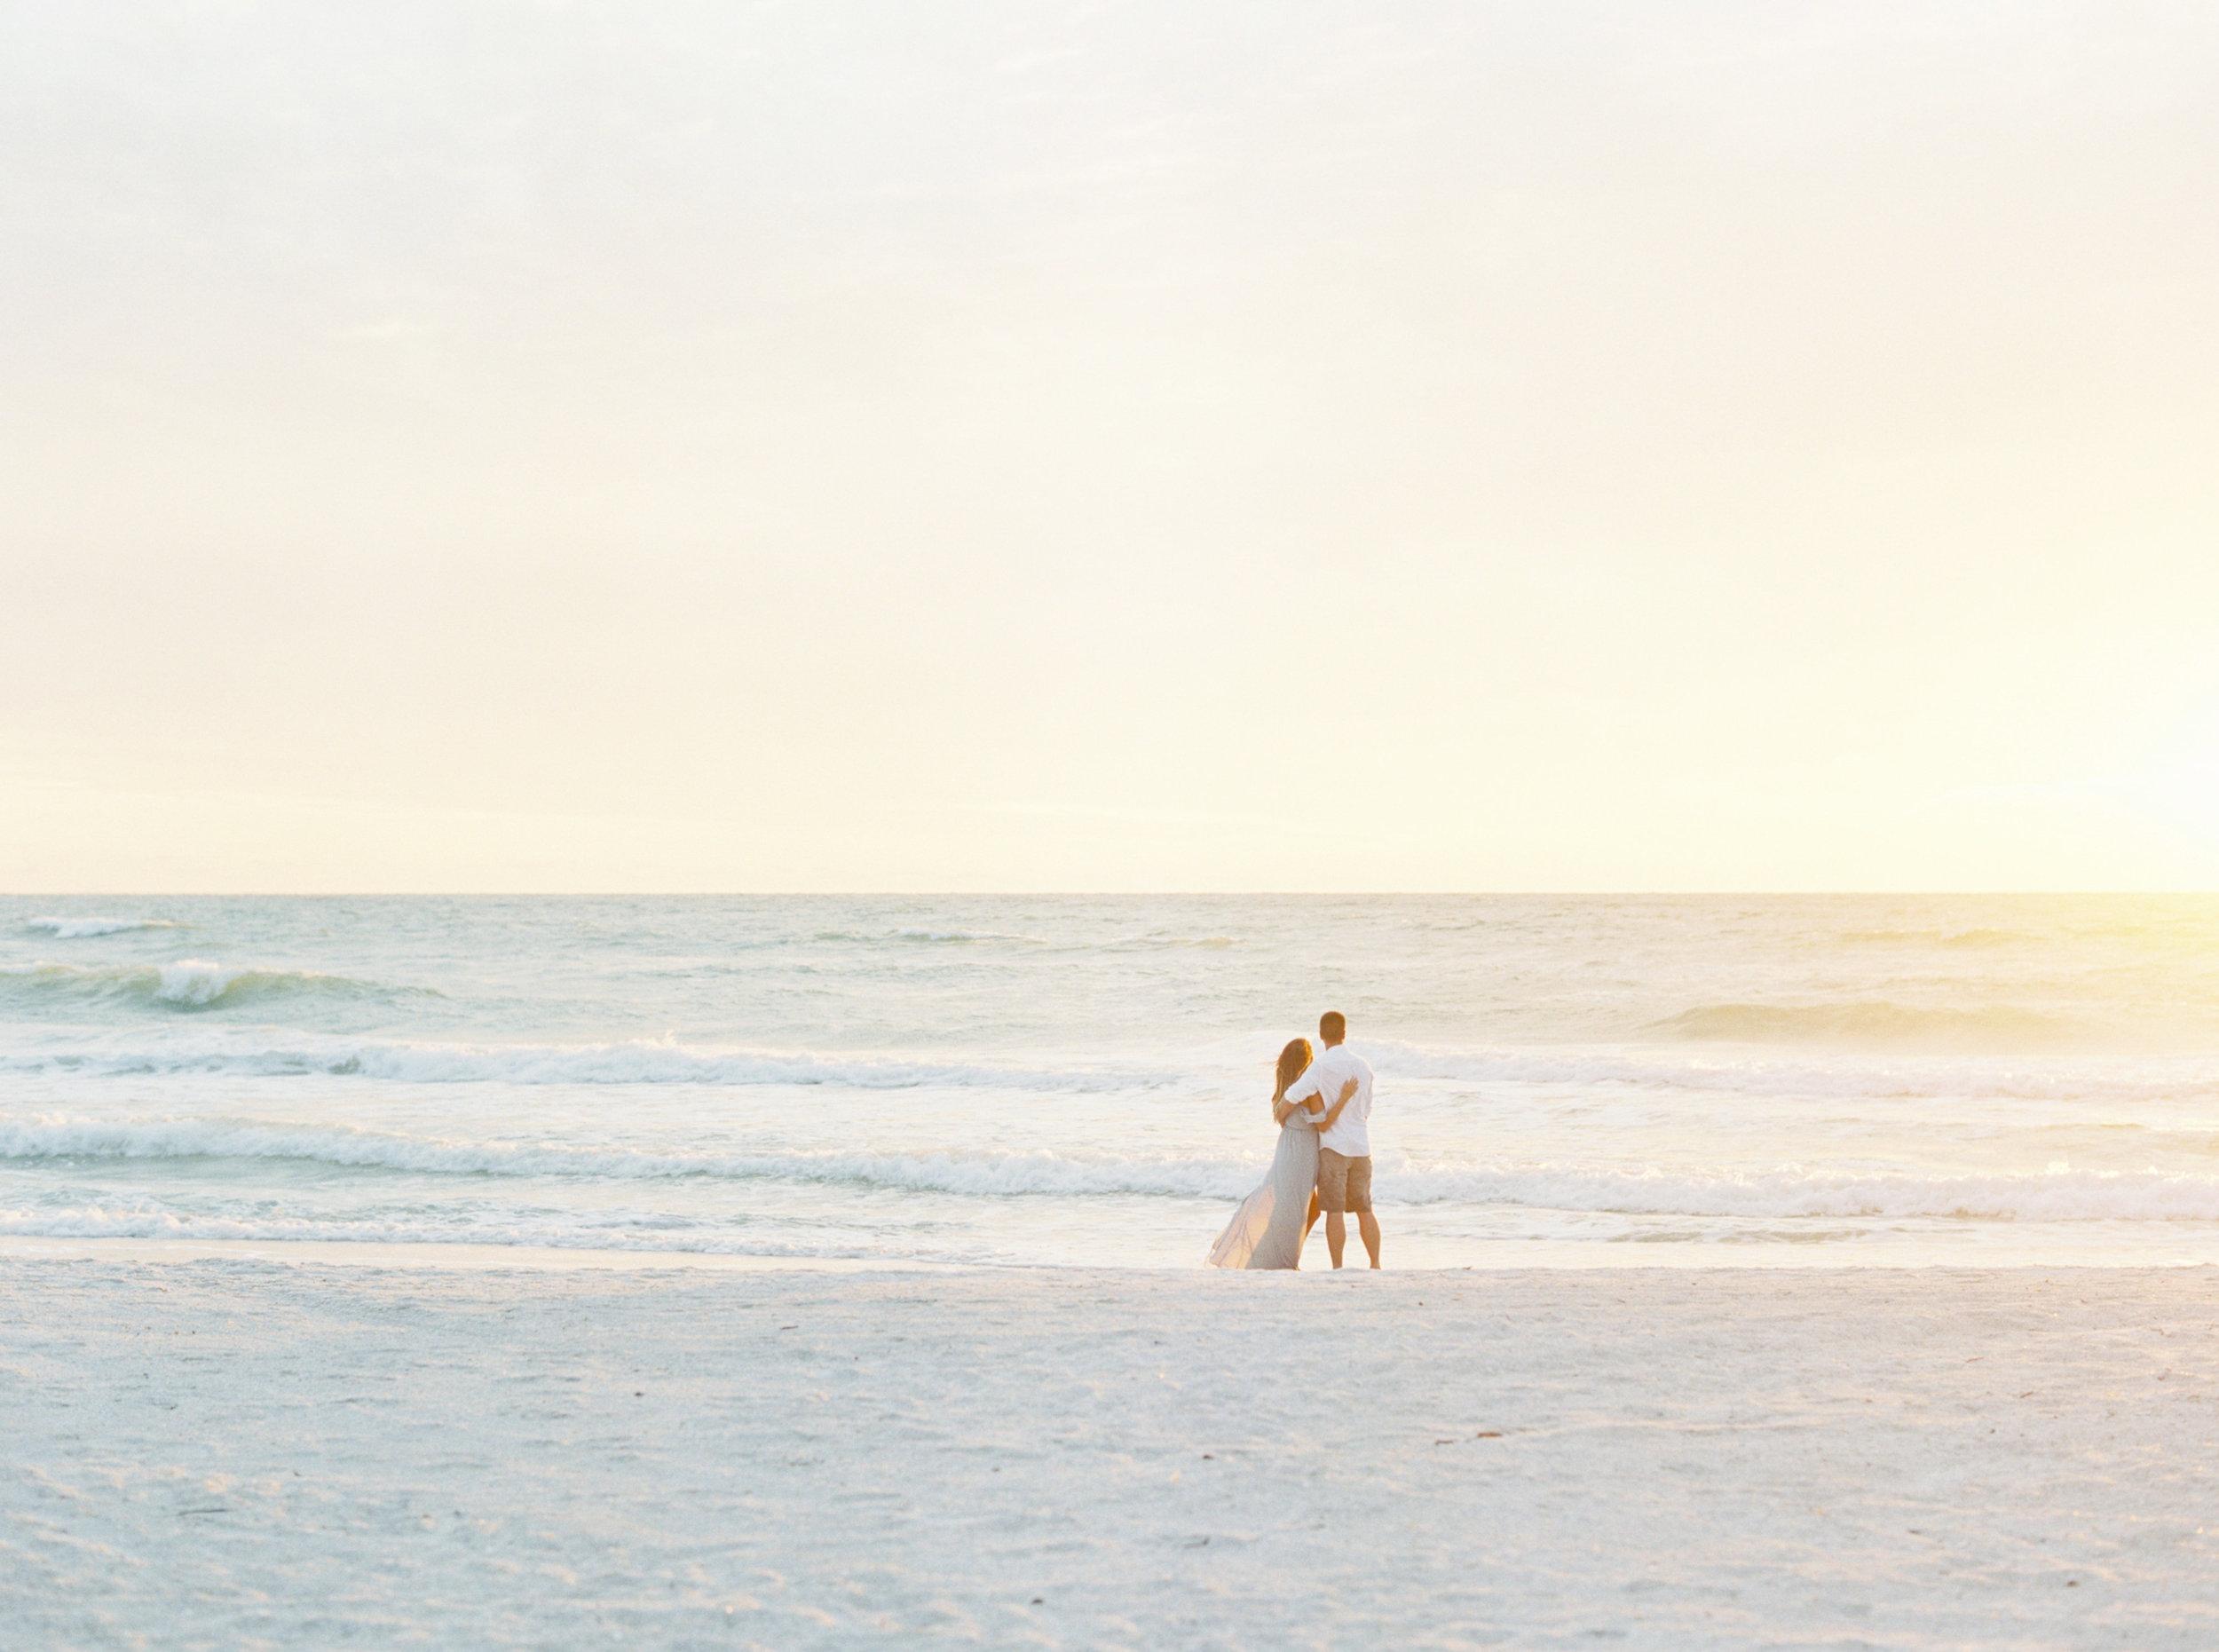 florida wedding photographer, beach wedding photographer, destination wedding photographer, film wedding photographer, georgia wedding photographer